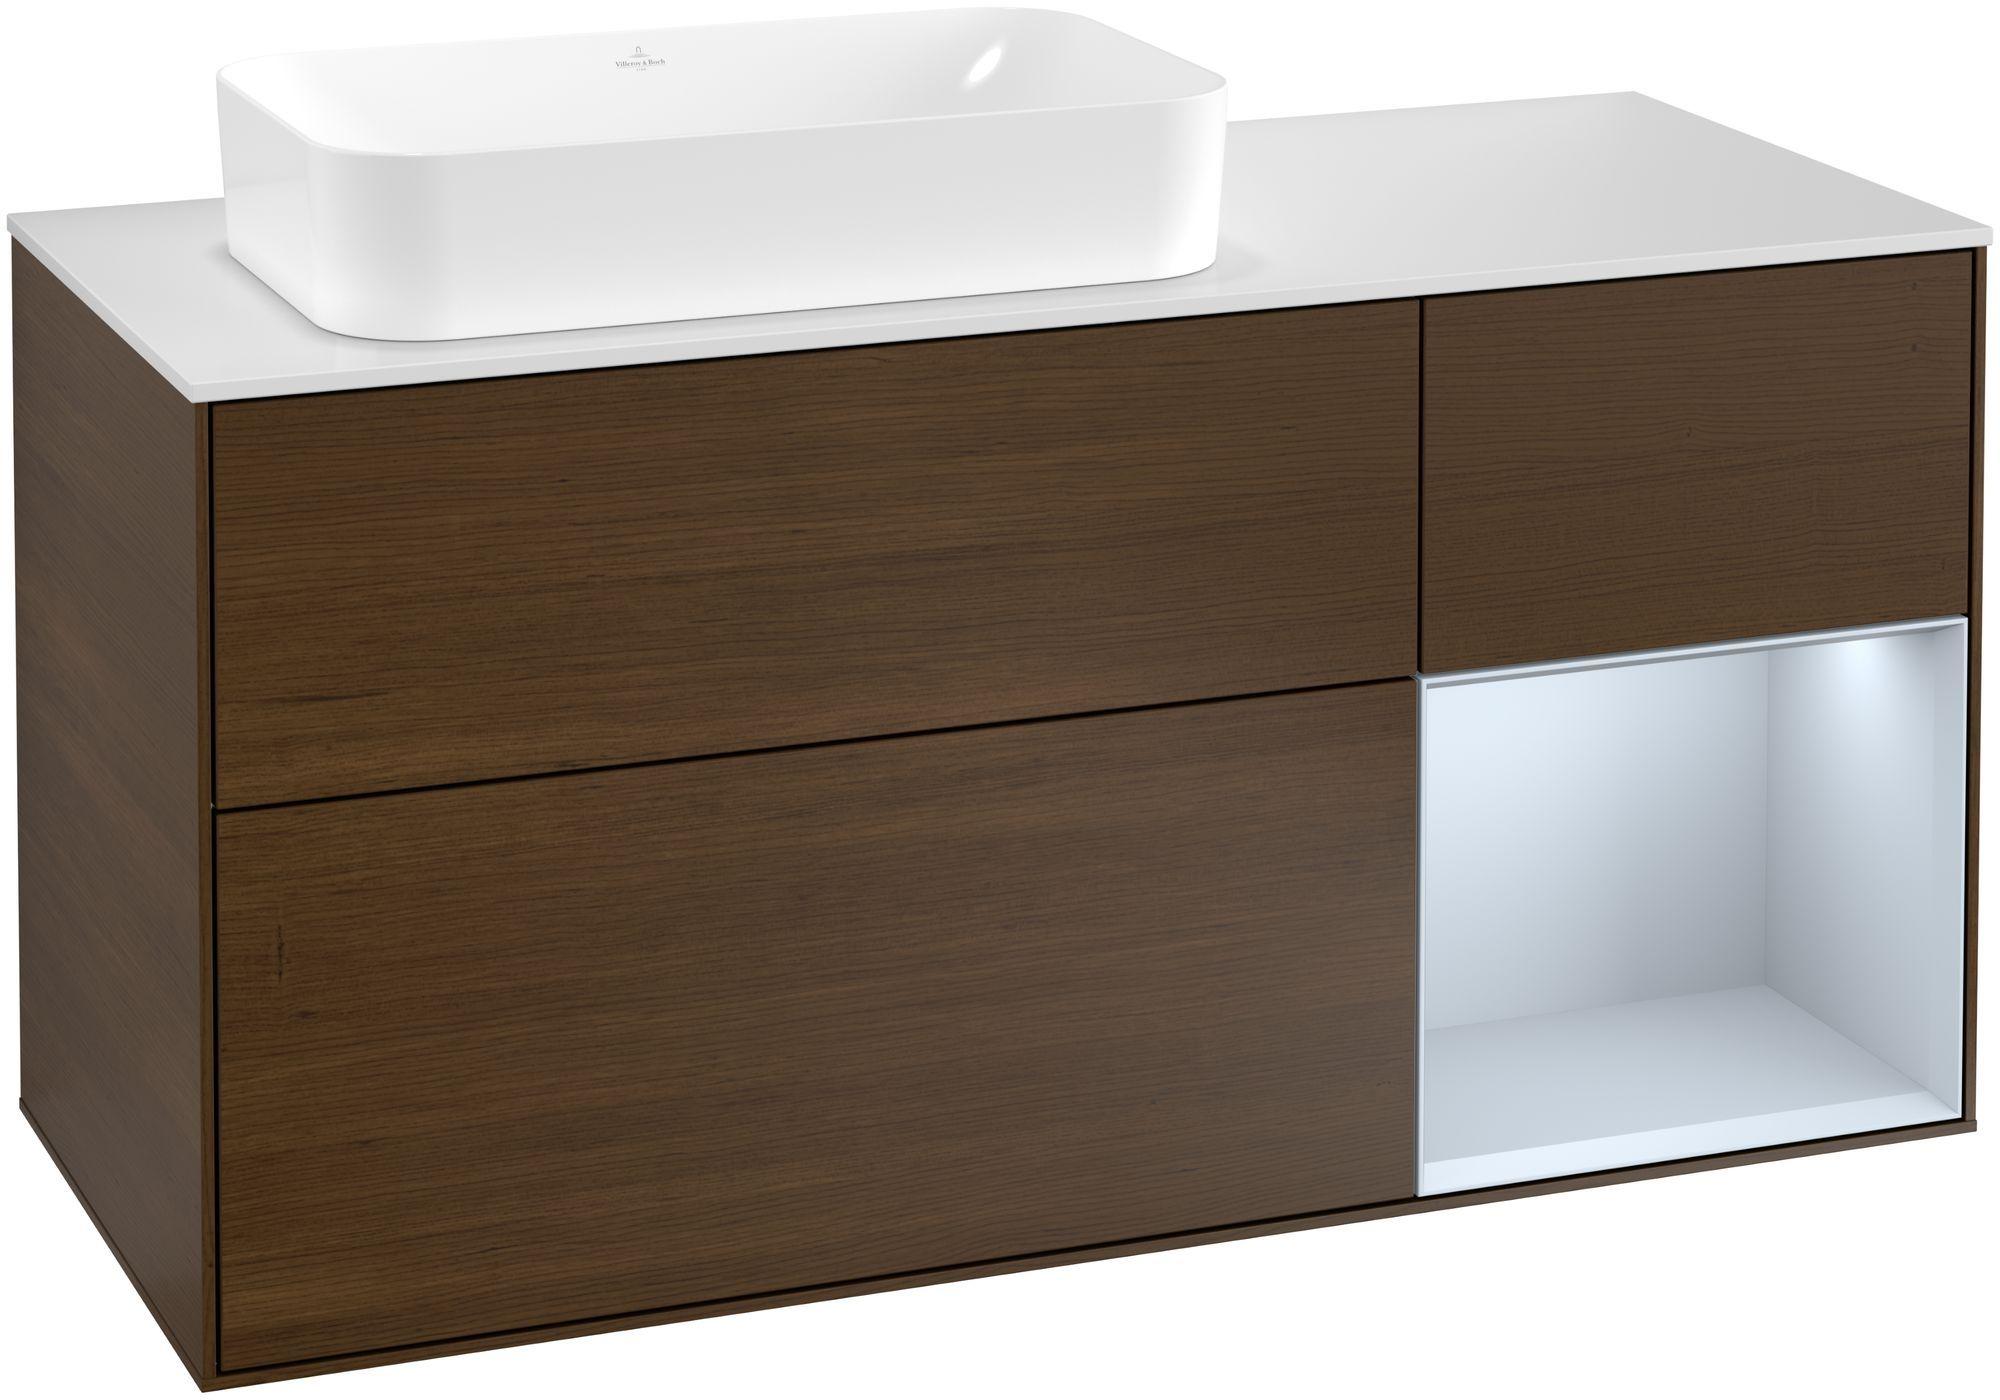 Villeroy & Boch Finion G28 Waschtischunterschrank mit Regalelement 3 Auszüge Waschtisch links LED-Beleuchtung B:120xH:60,3xT:50,1cm Front, Korpus: Walnut Veneer, Regal: Cloud, Glasplatte: White Matt G281HAGN